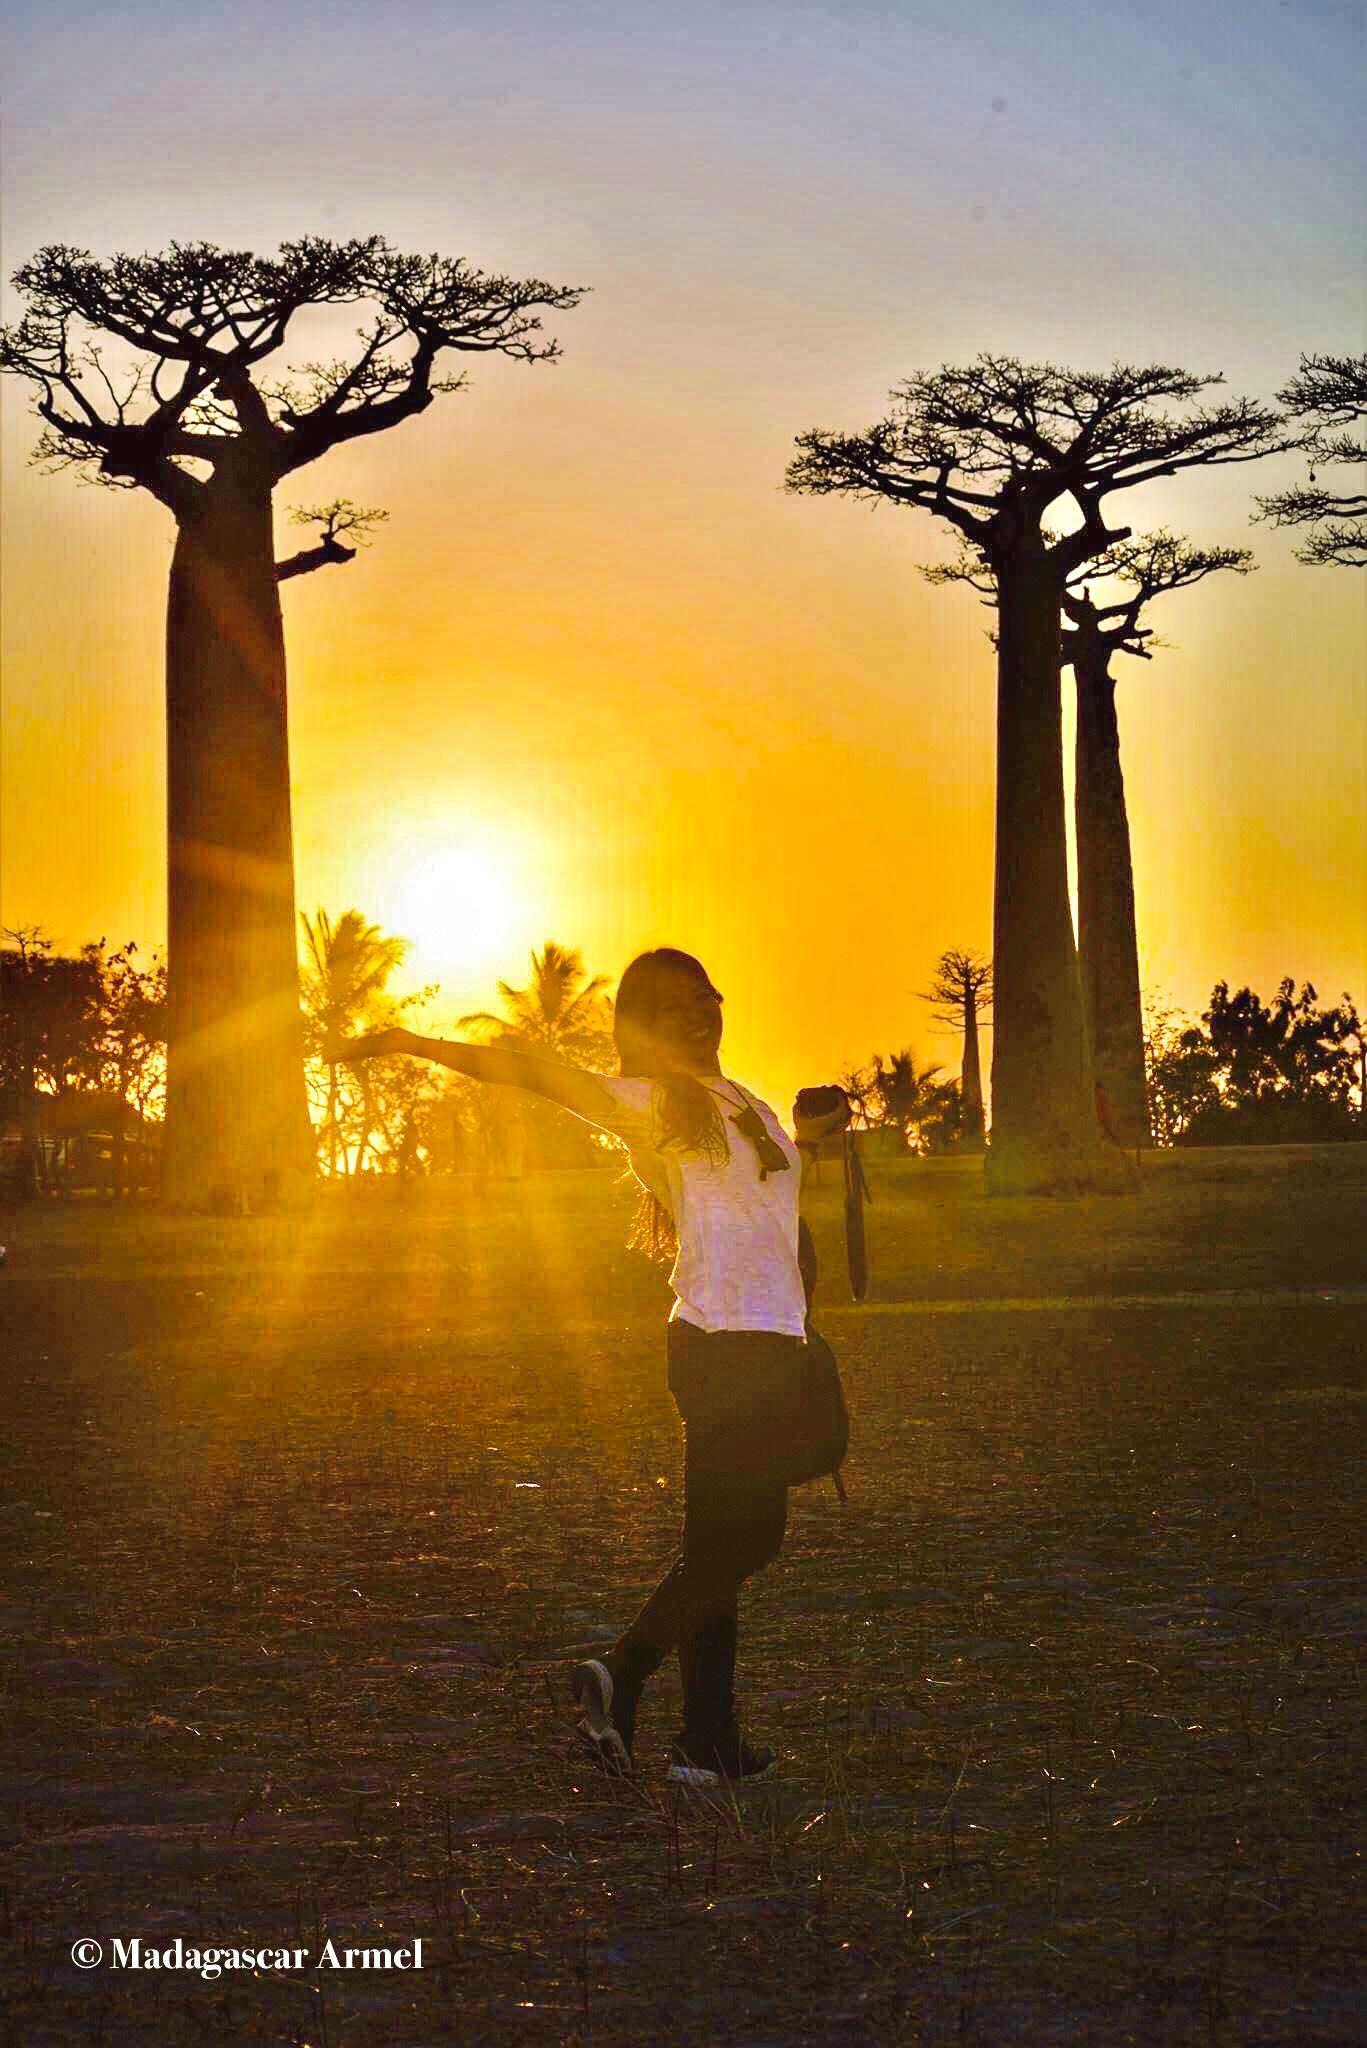 Photo by Madagascar